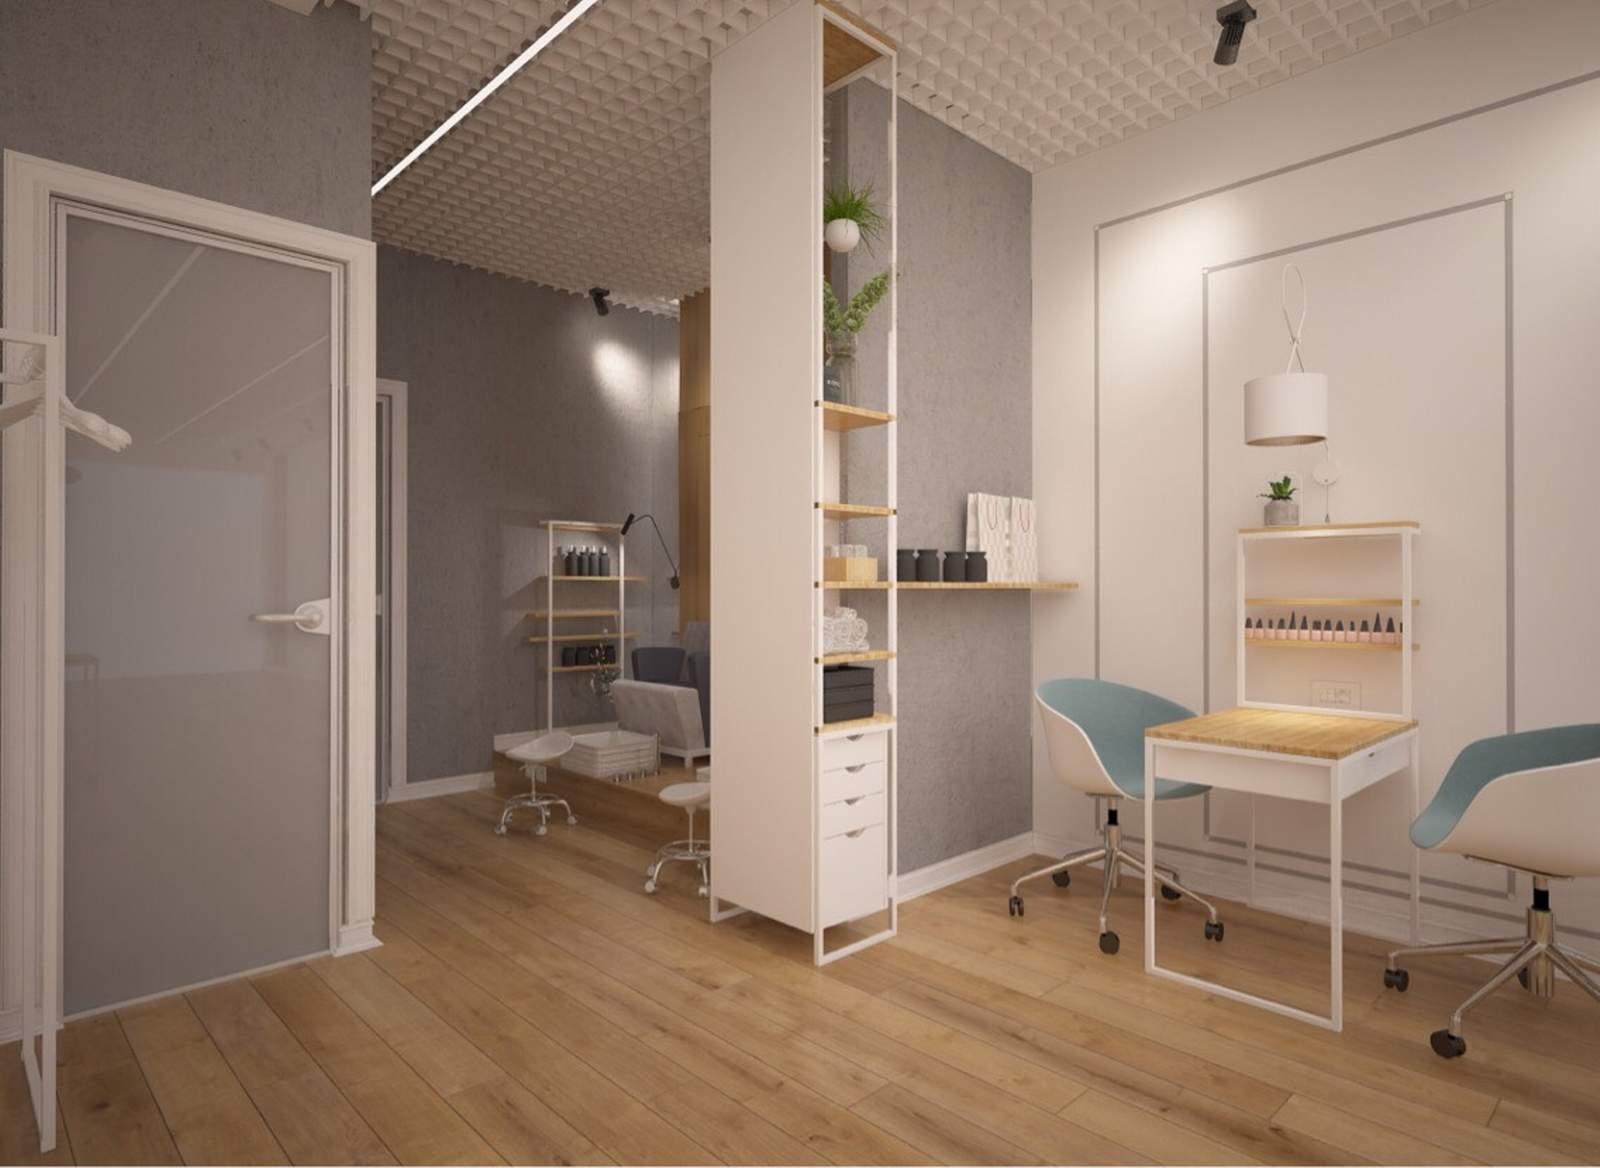 lulu_nail_interior_745_1600x1168_1600x1168